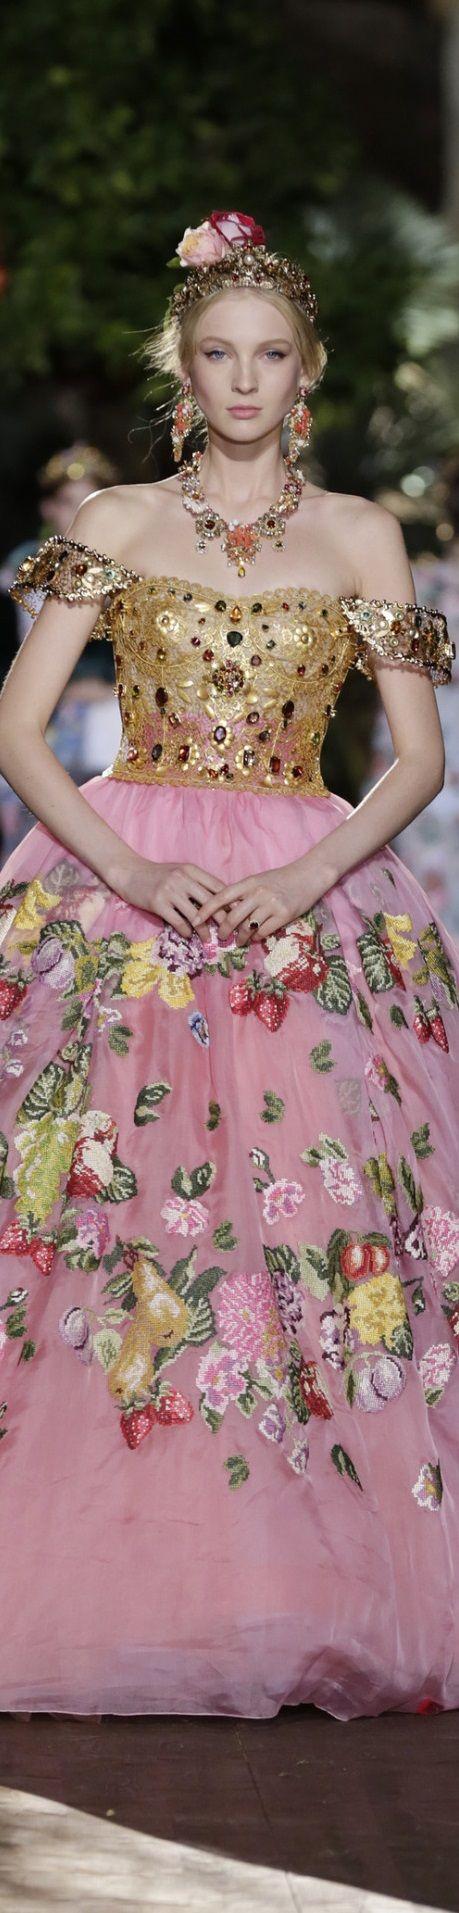 Dolce & Gabbana Alta Moda Fall 2015. Inspiration for Model Under Cover. http://www.carinaaxelsson.com #modelundercover